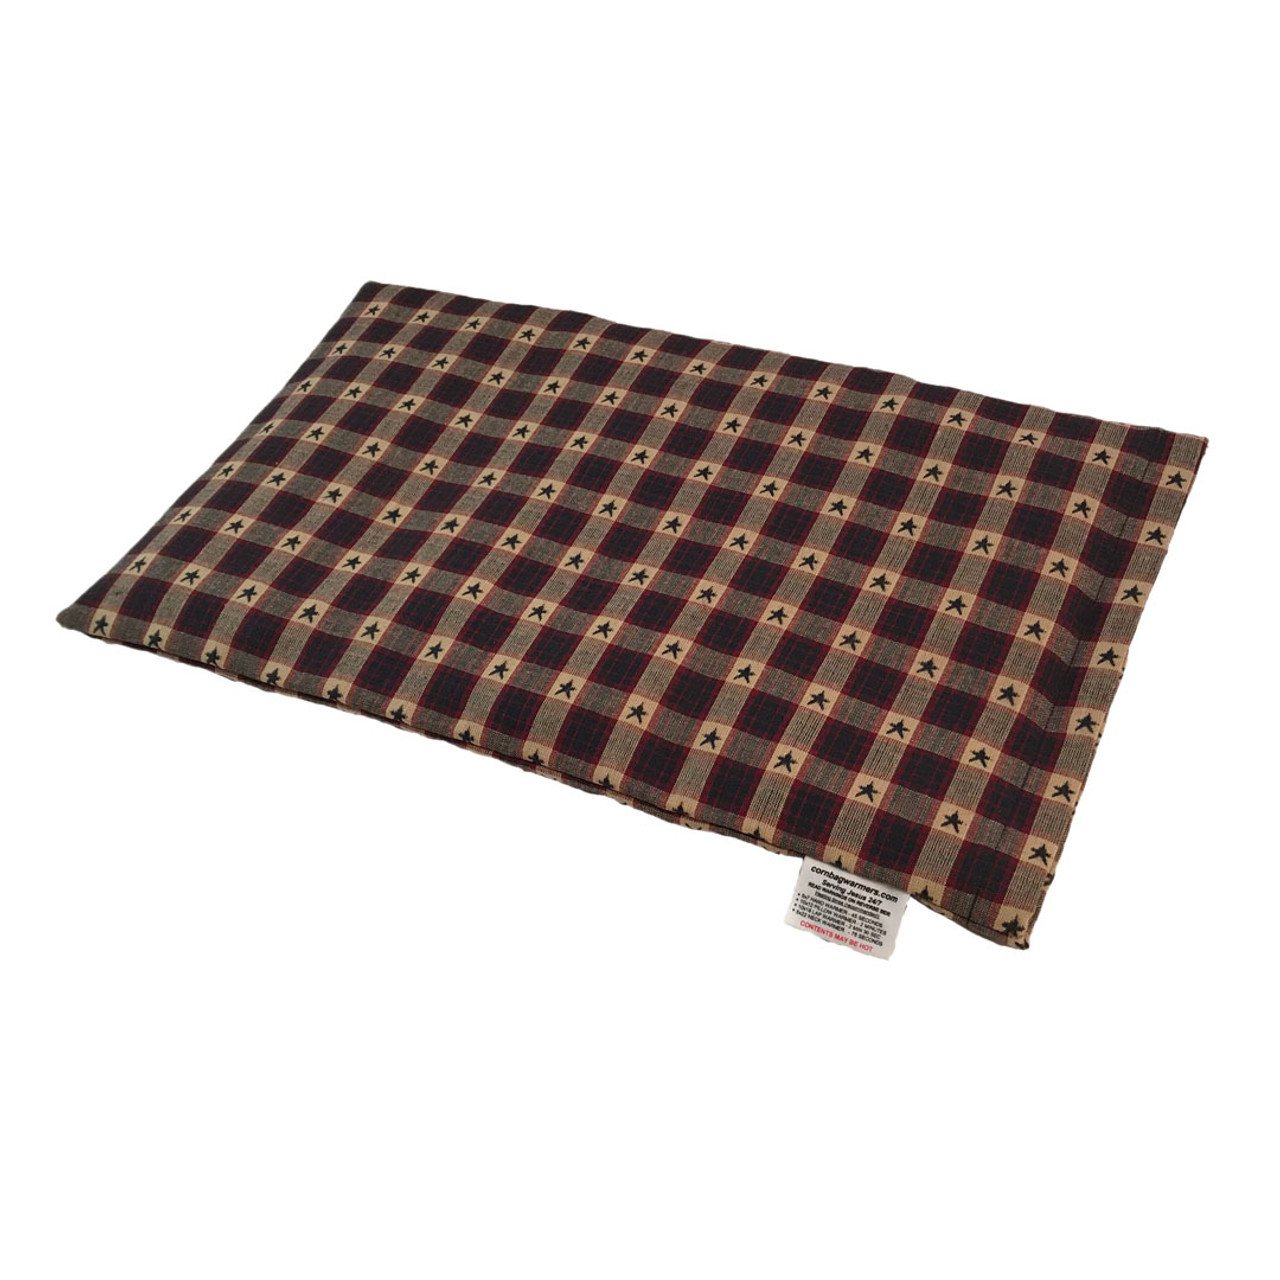 Patriotic Stras Lap Cornbag Warmer - Corn Filled Microwave Heating Pad